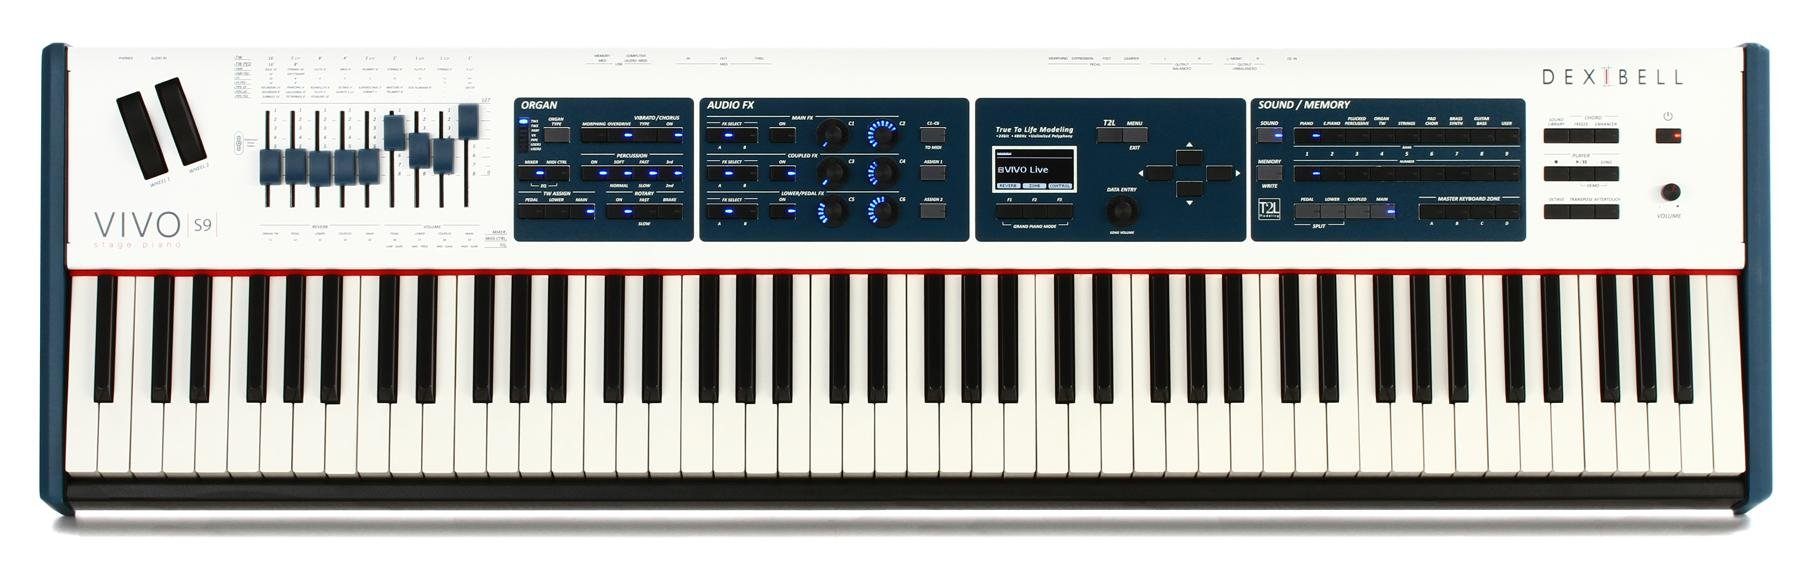 Dexibell VIVO S9 88-key Digital Piano | Sweetwater